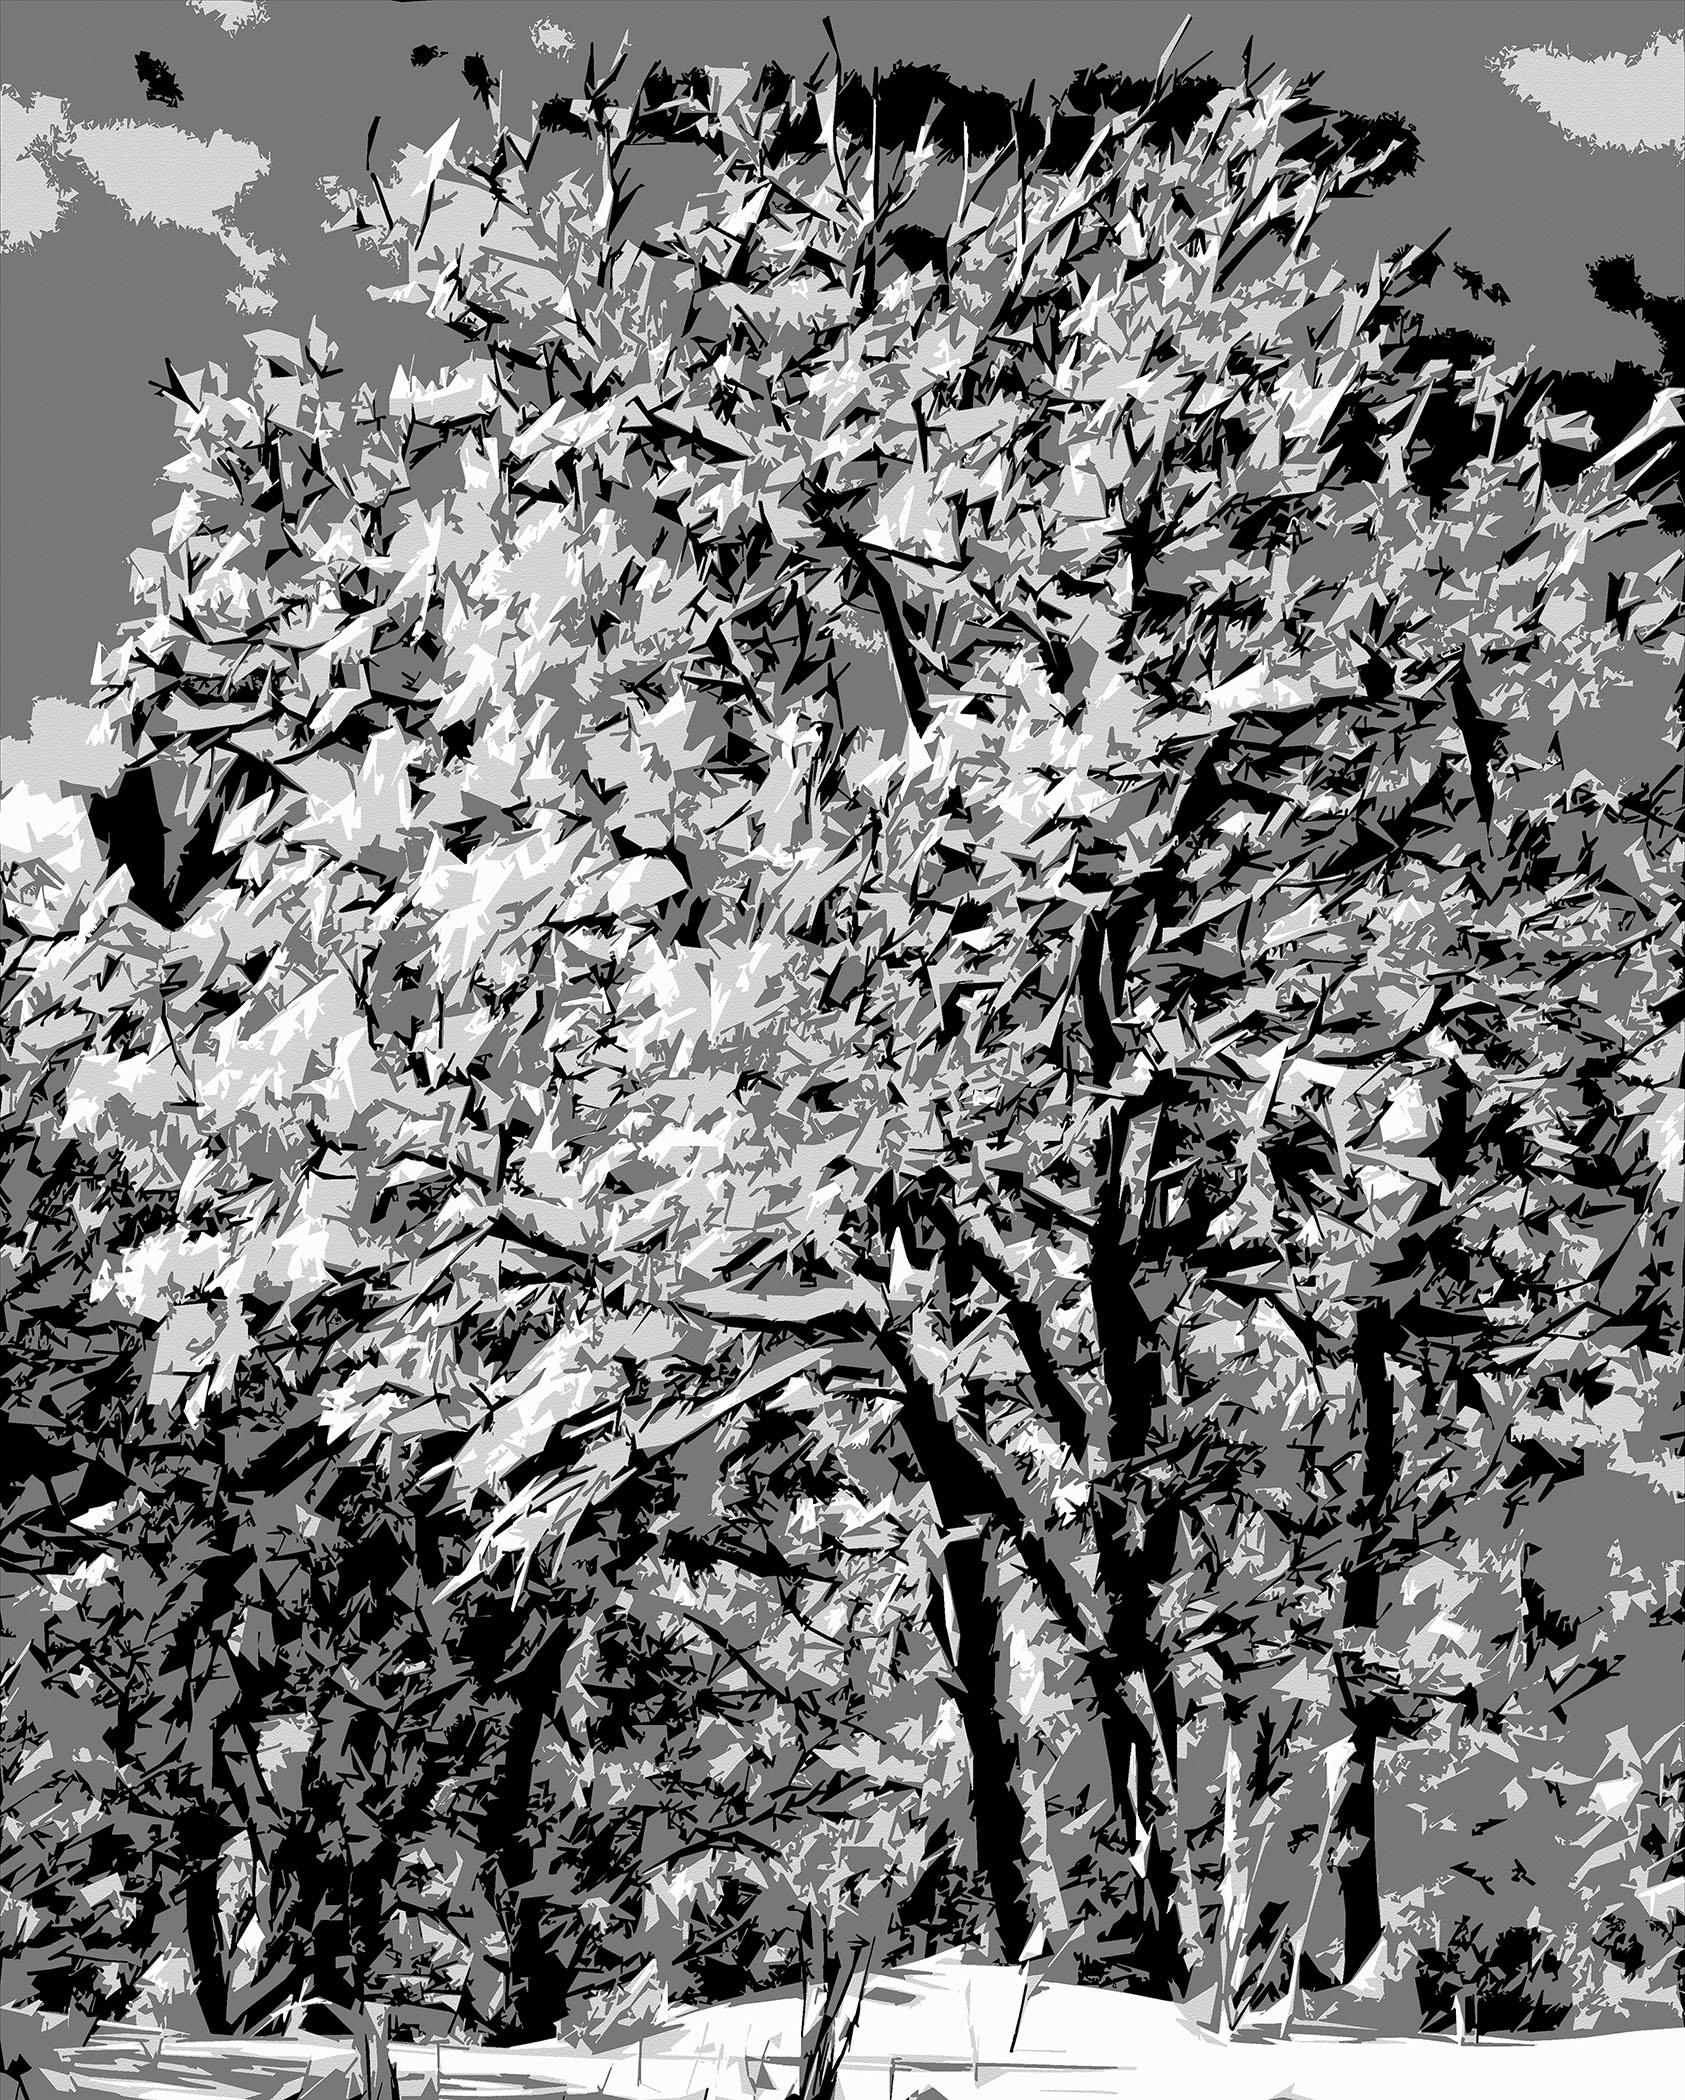 Michael Fain - Winter Trees 16 2/6